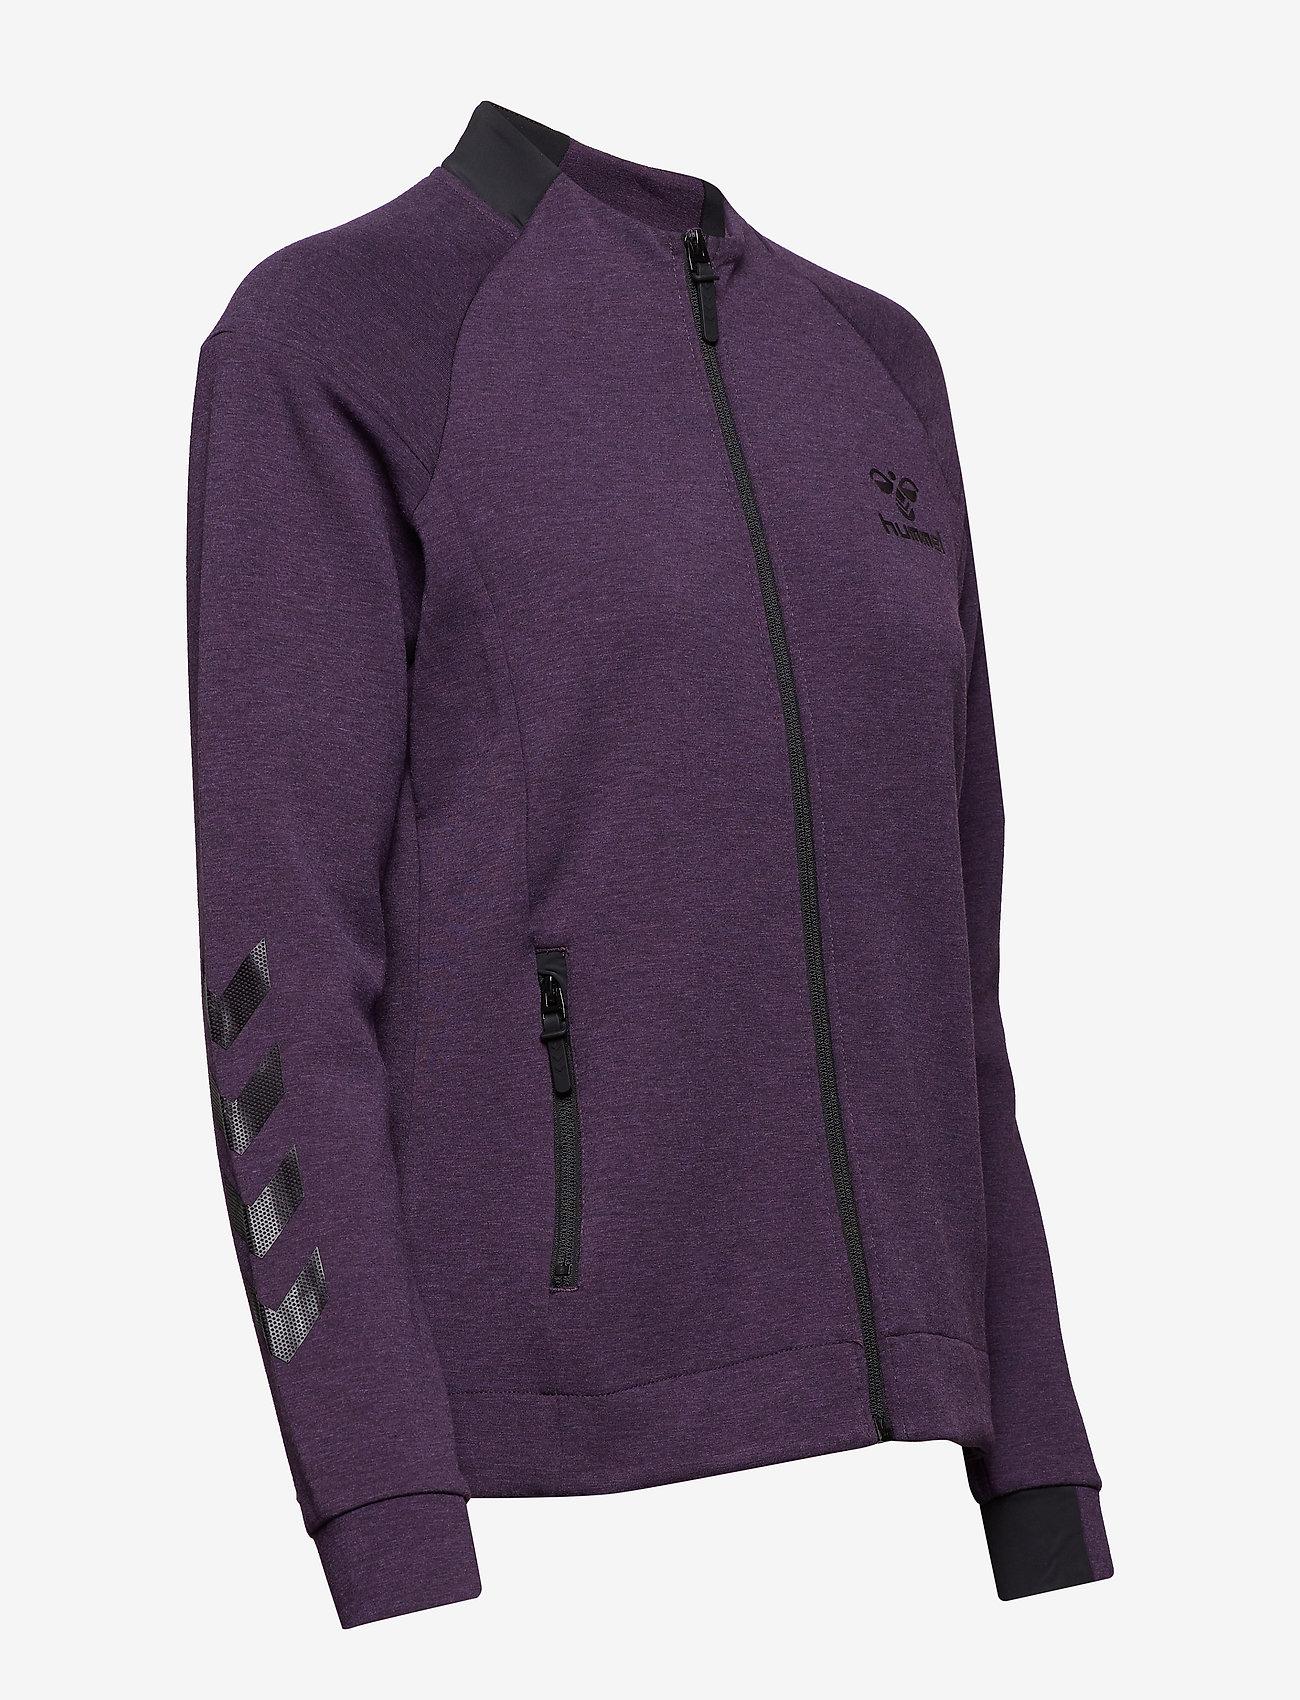 Hummel HMLCLIO ZIP JACKET - Sweatshirts BLACKBERRY CORDIAL MELANGE - Dameklær Spesialtilbud